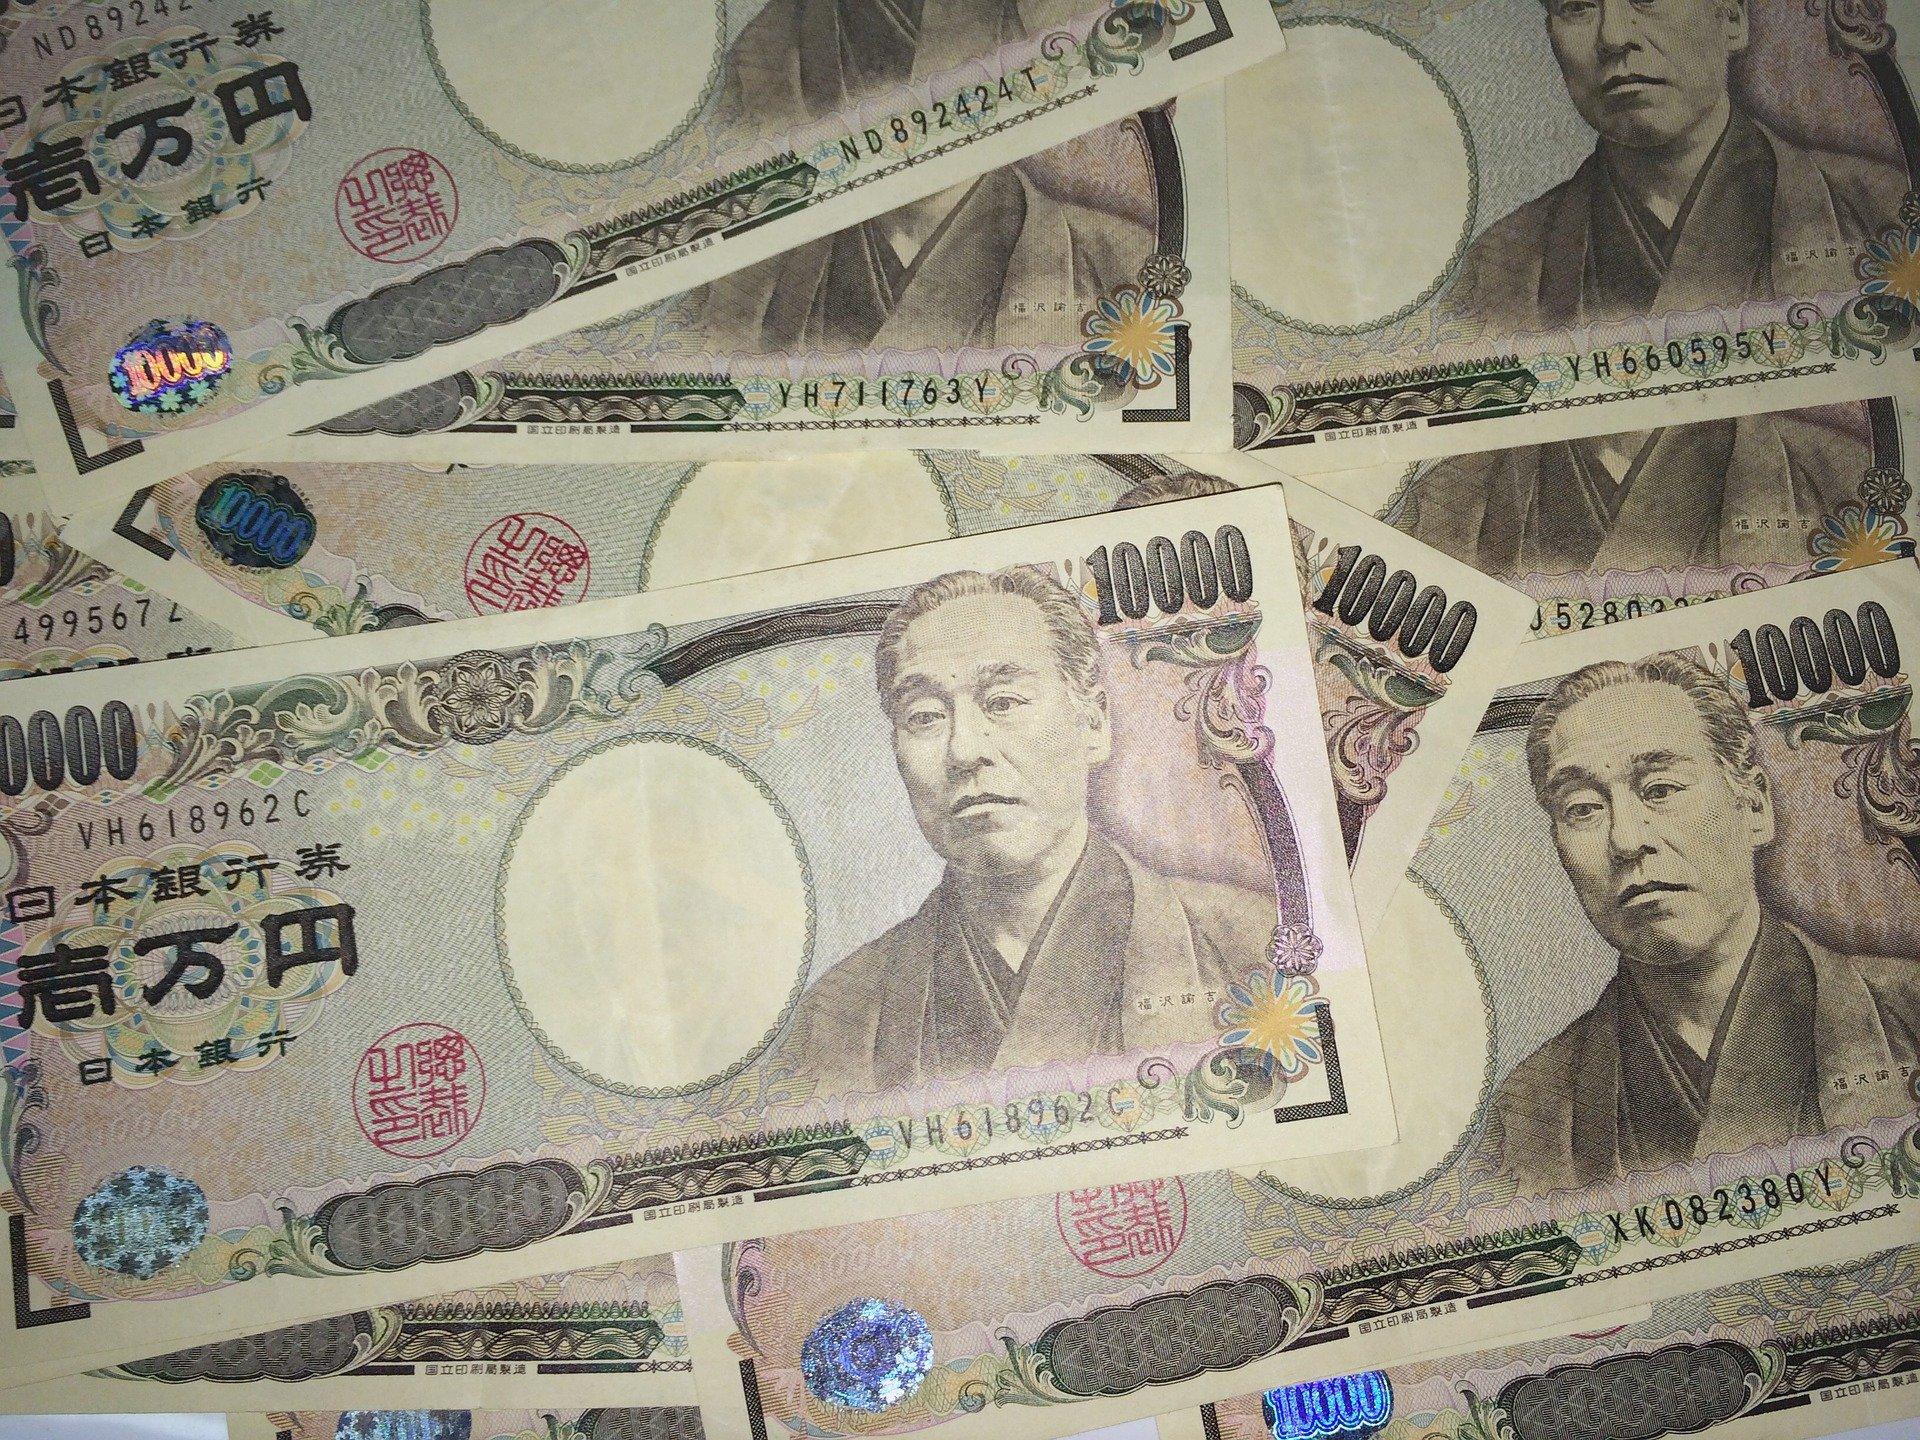 【FX】FXで円高になると損する人する理由解説‼